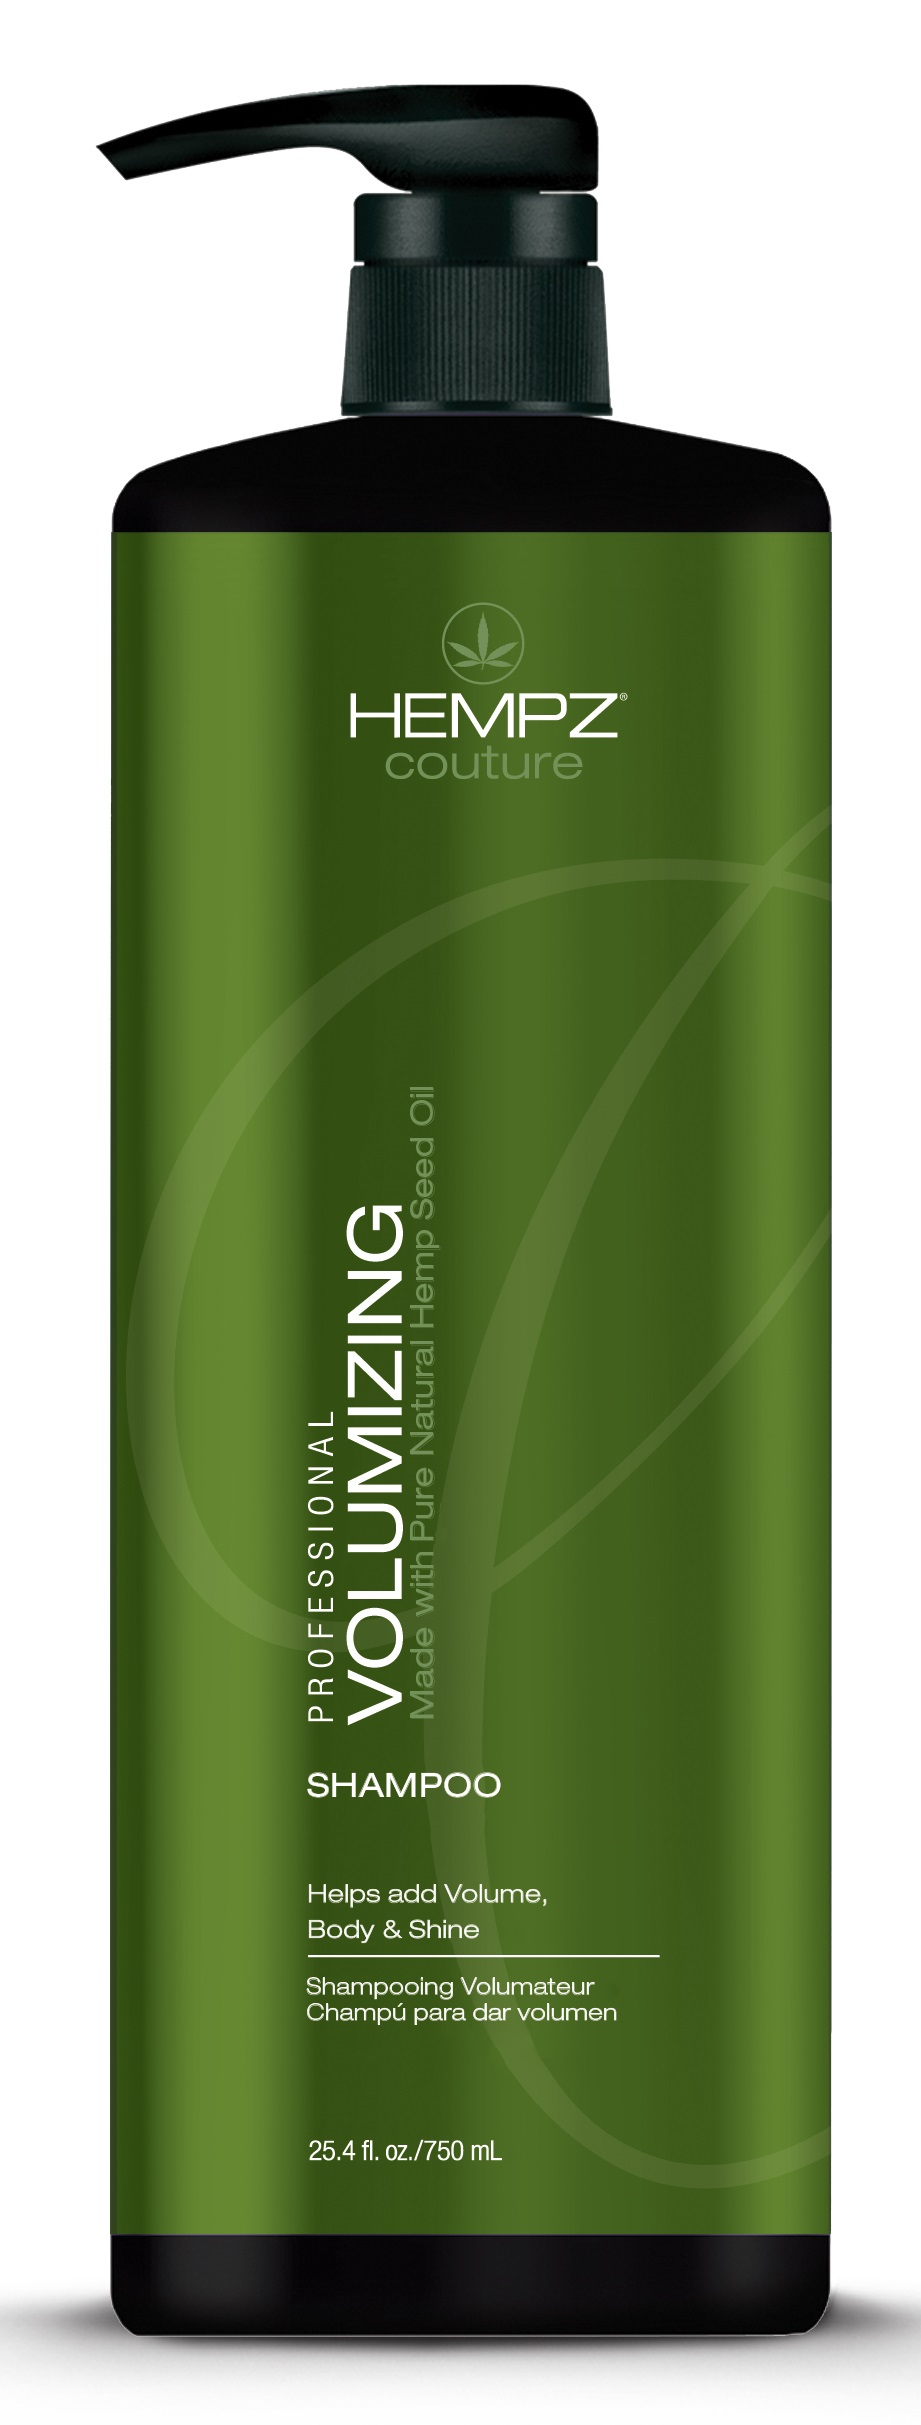 Billede af Hempz Volumizing Shampoo 750ml